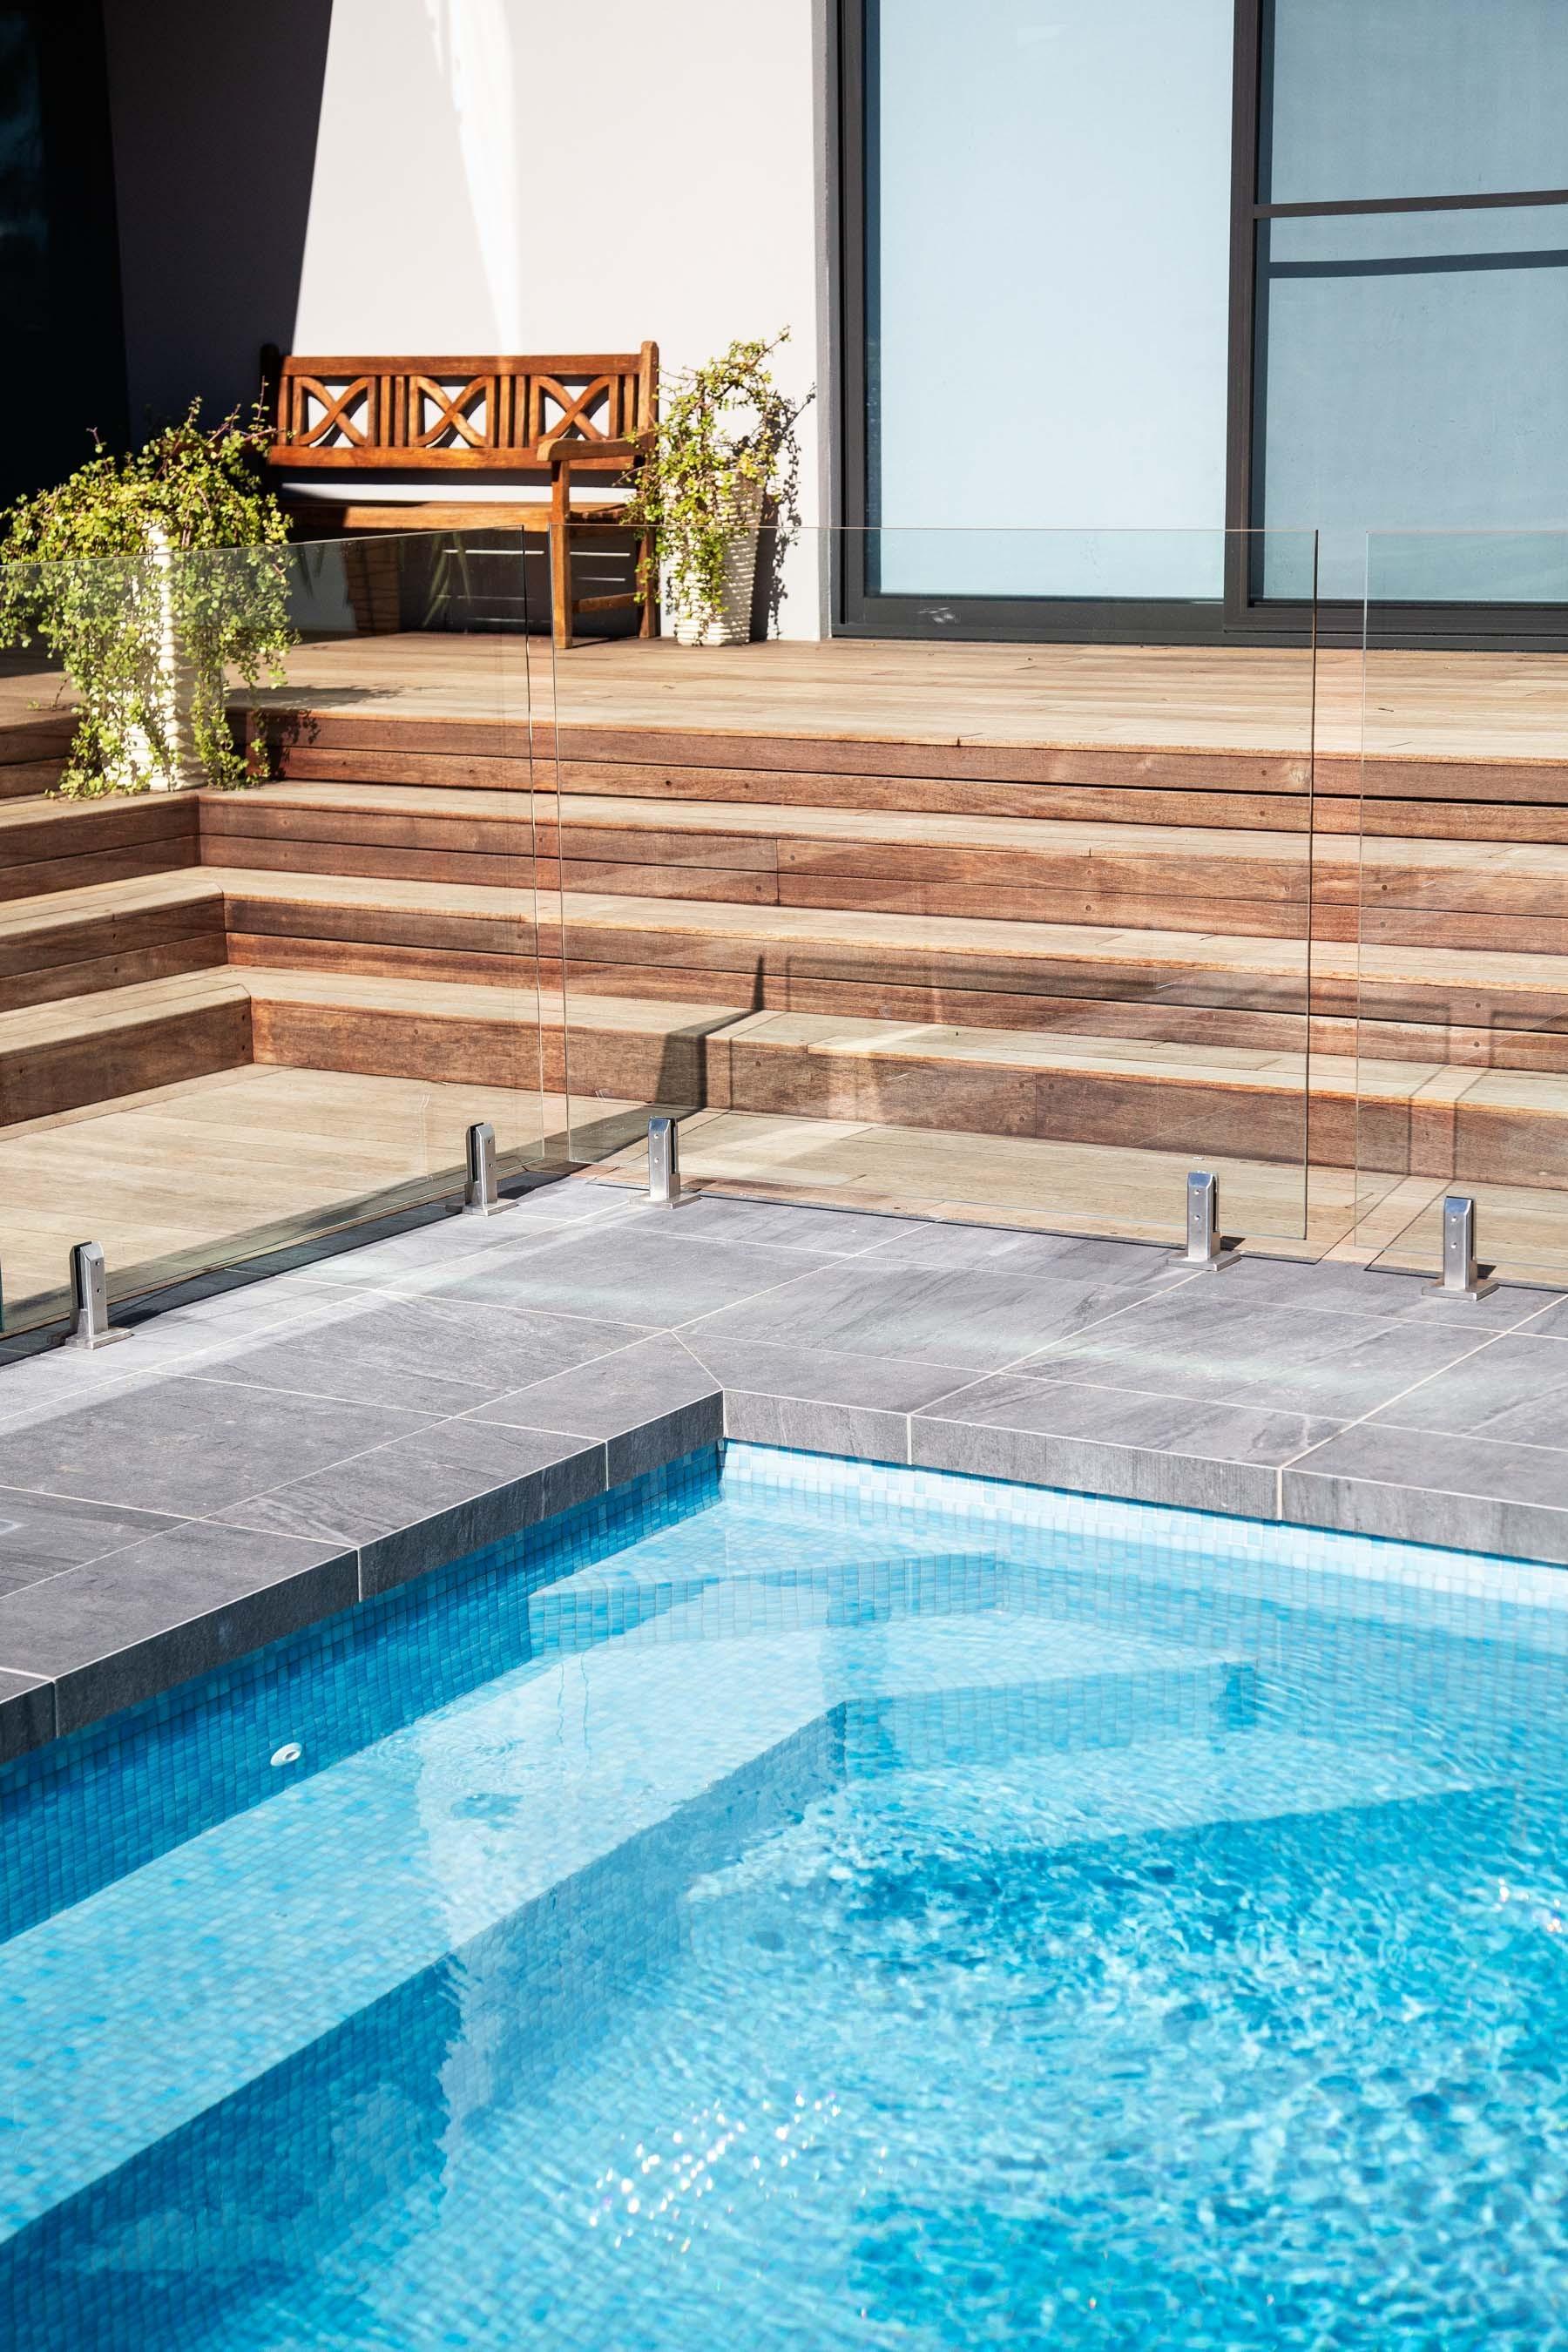 Pool-Tiles Gallery Australian hayman-05